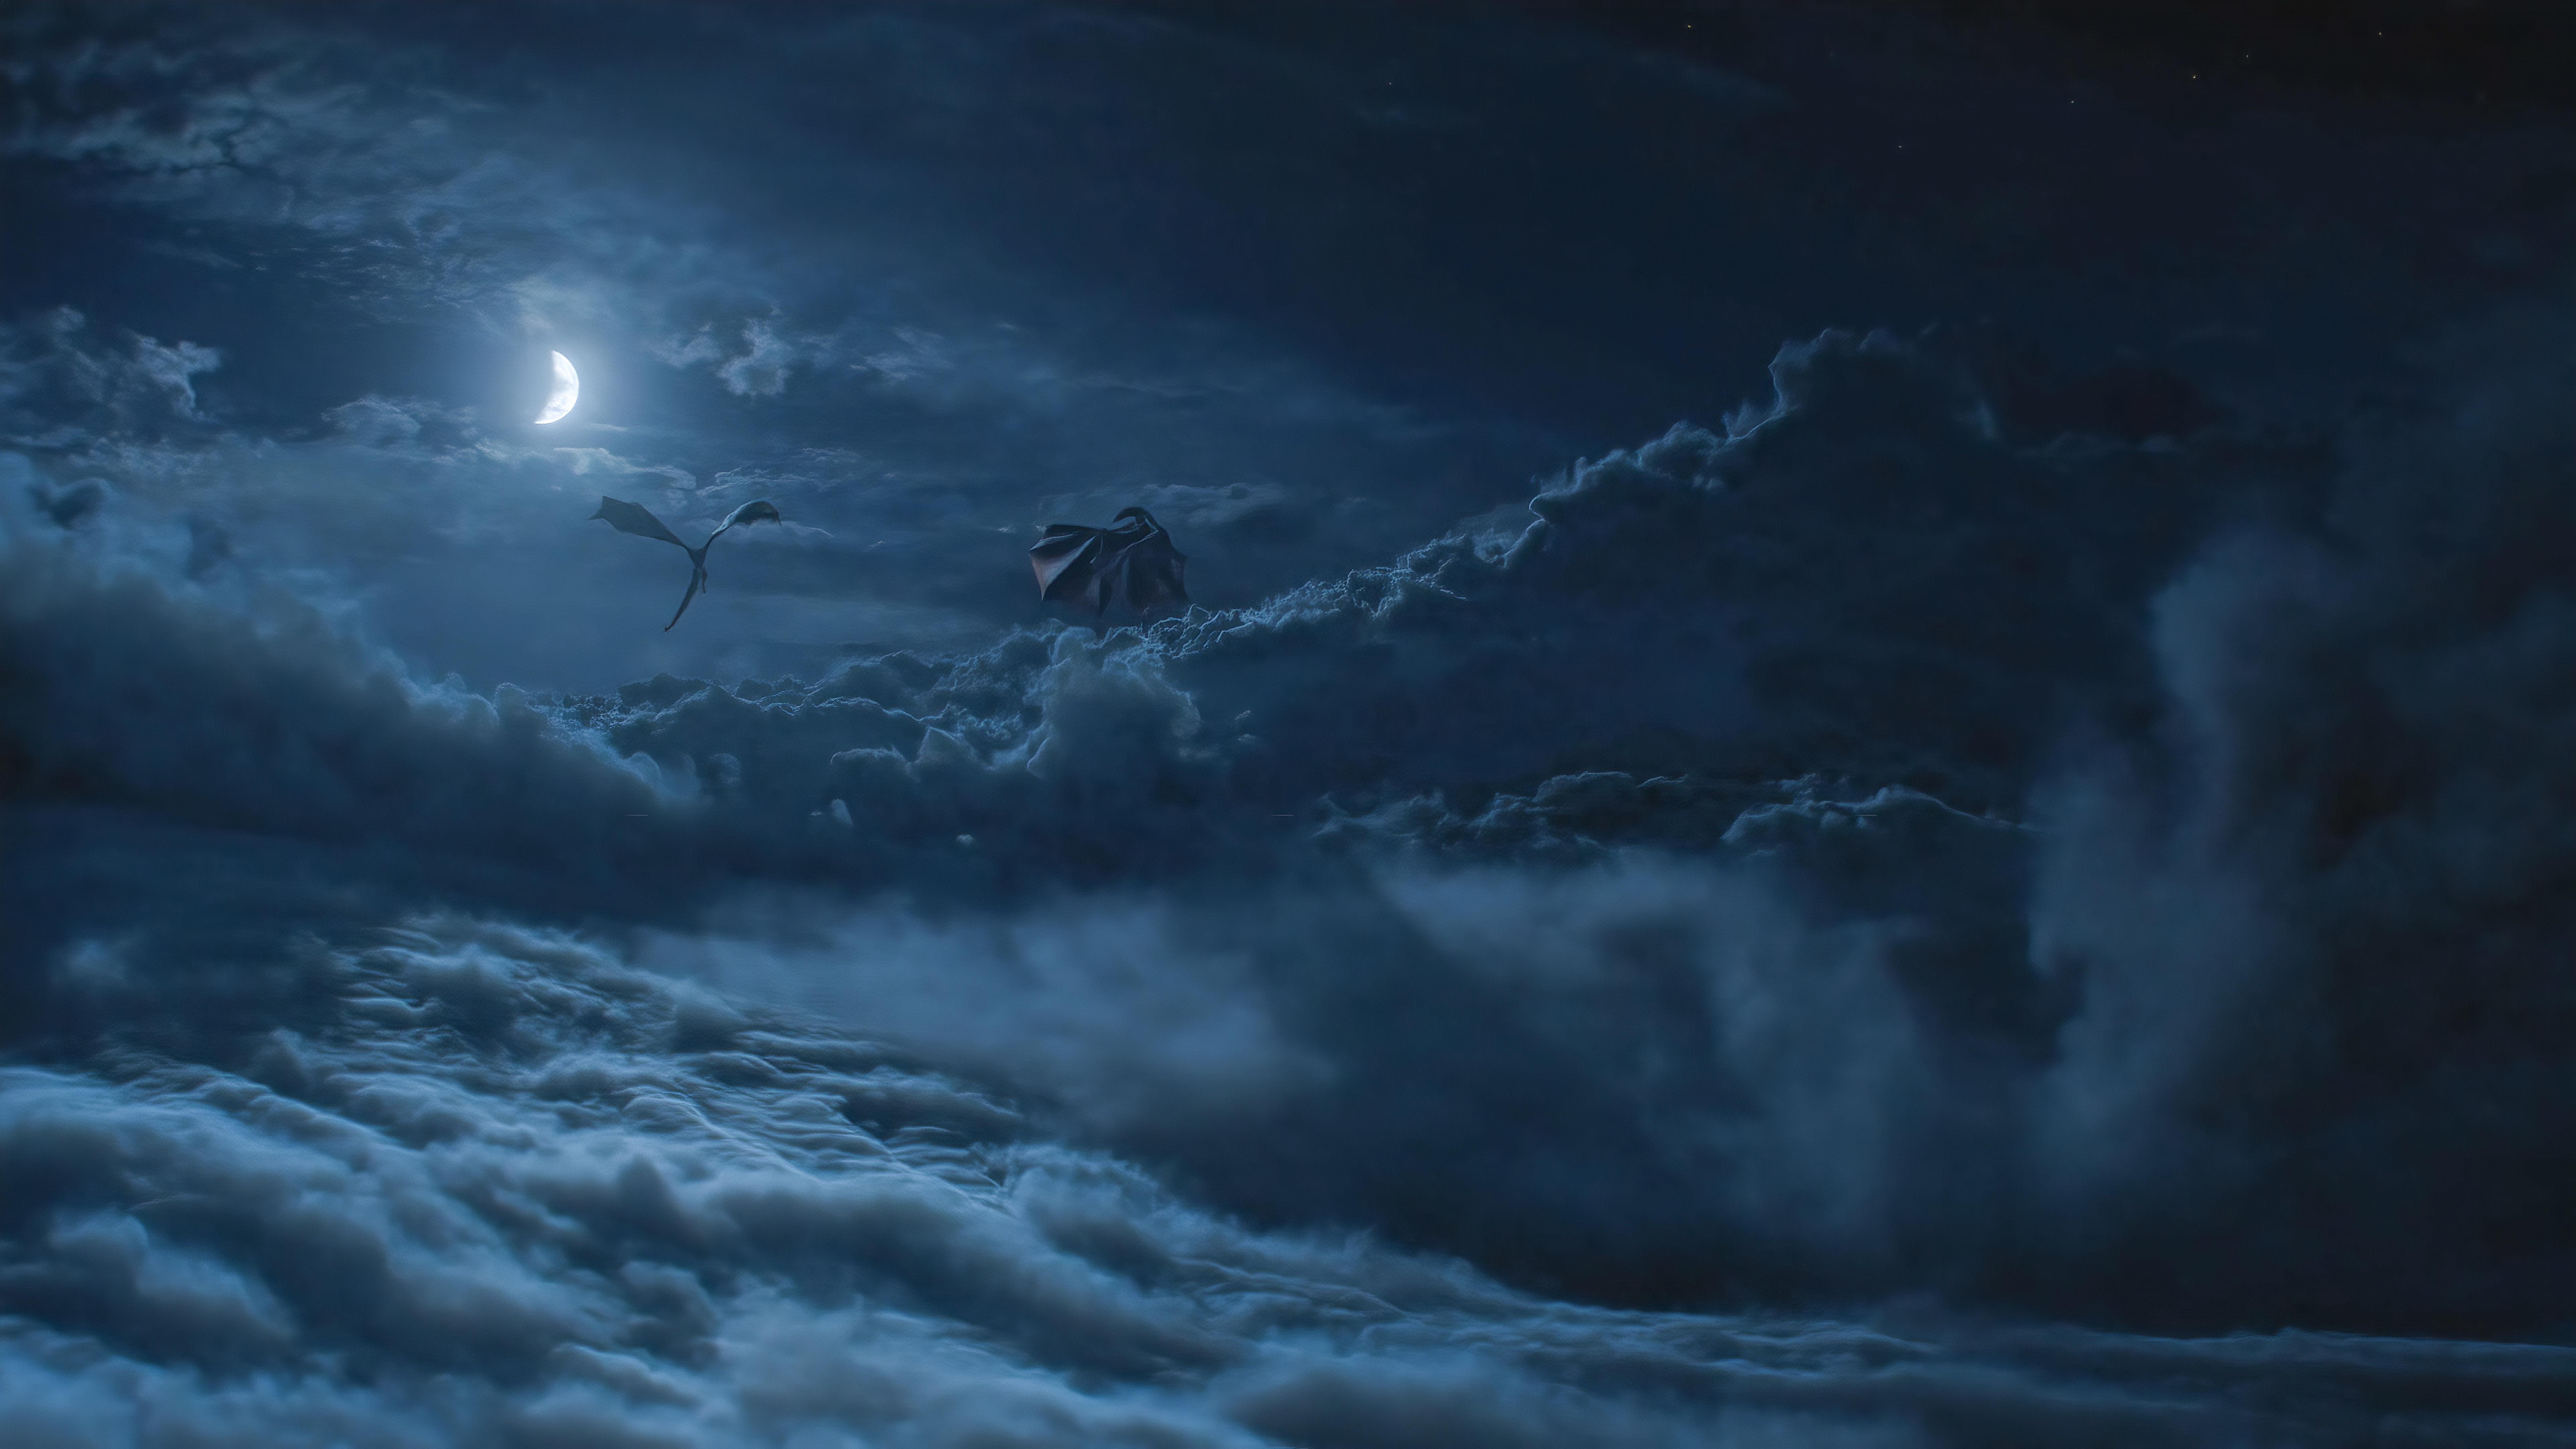 Dragons Above Cloud Game Of Throne Season 8 Wallpaper Hd Tv